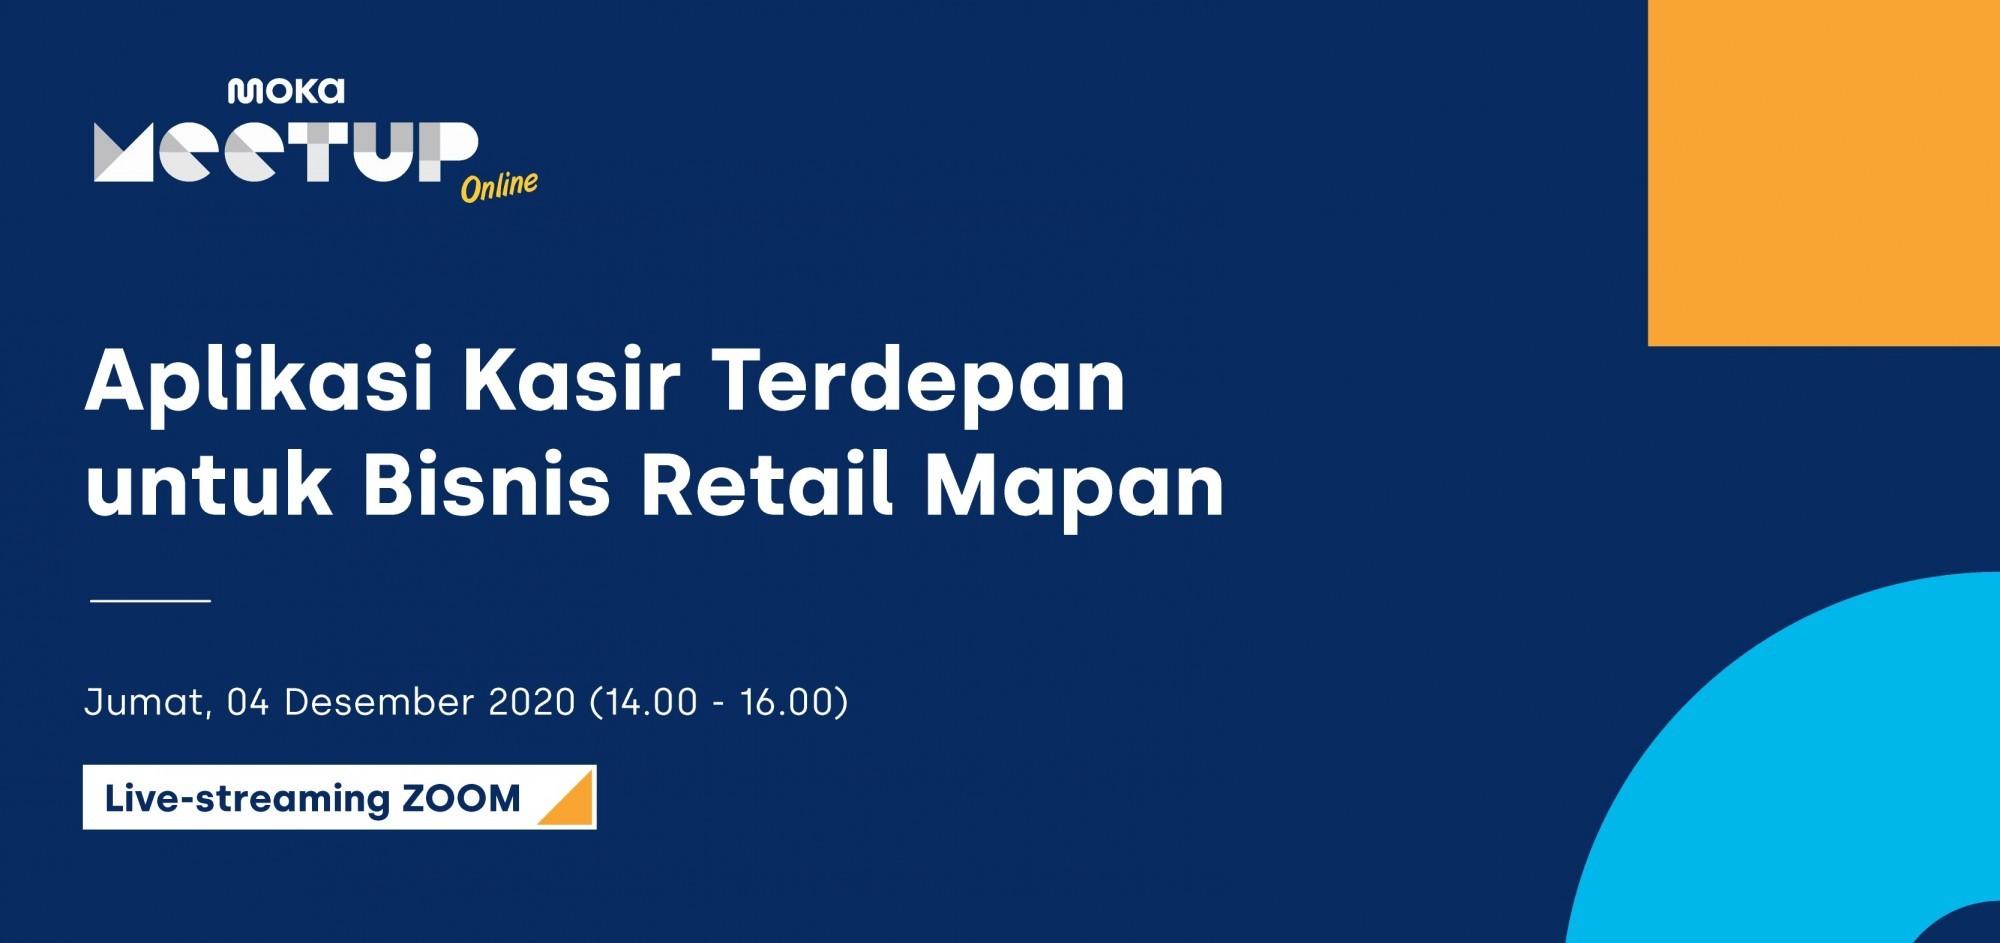 Moka Meetup Online: Aplikasi Kasir Terdepan Untuk Bisnis Retail Mapan